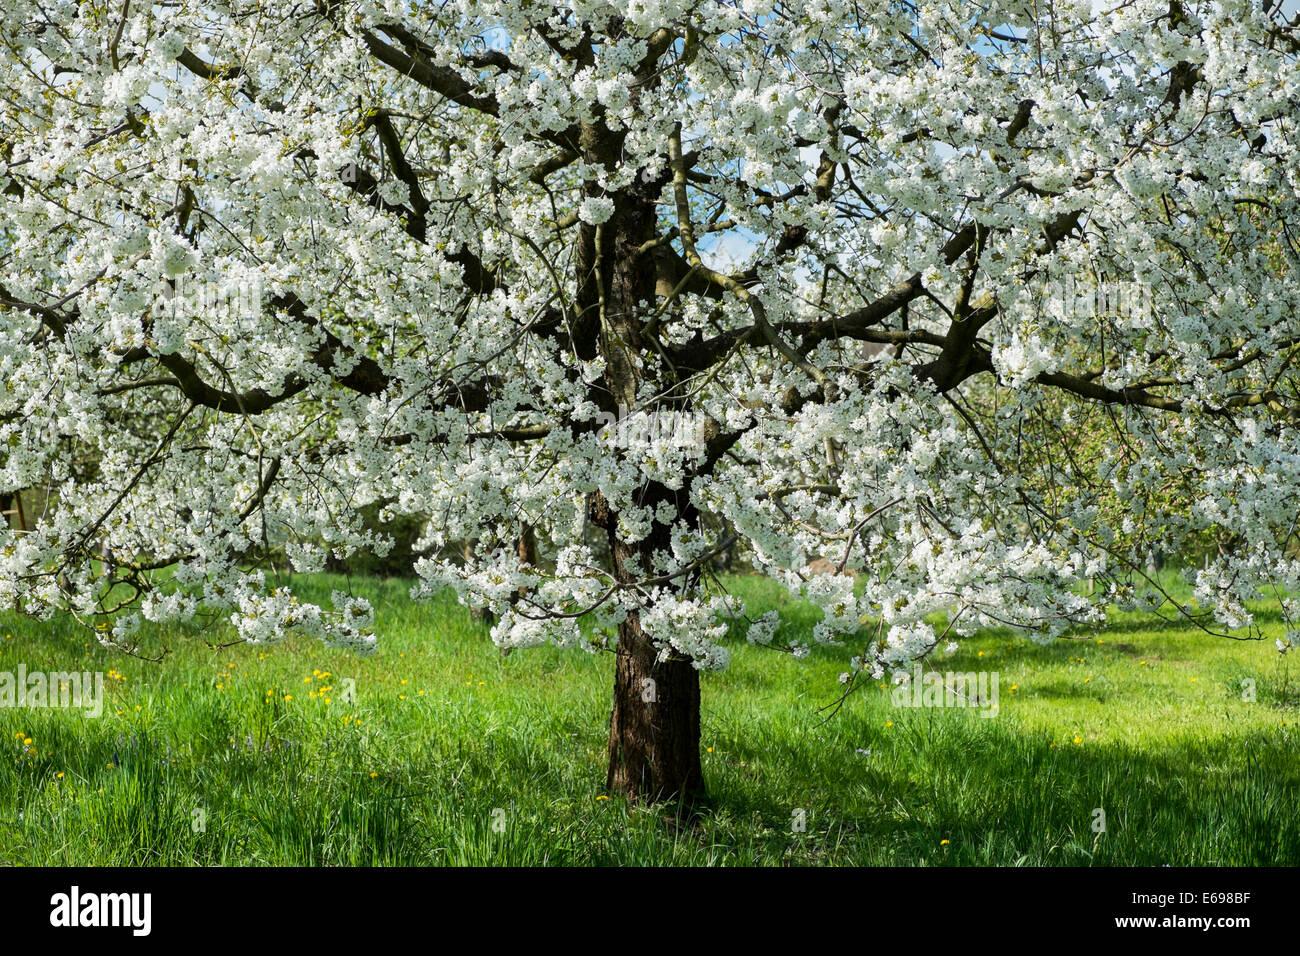 Fruit tree in blossom, Bodenseekreis district, Baden-Württemberg, Germany - Stock Image